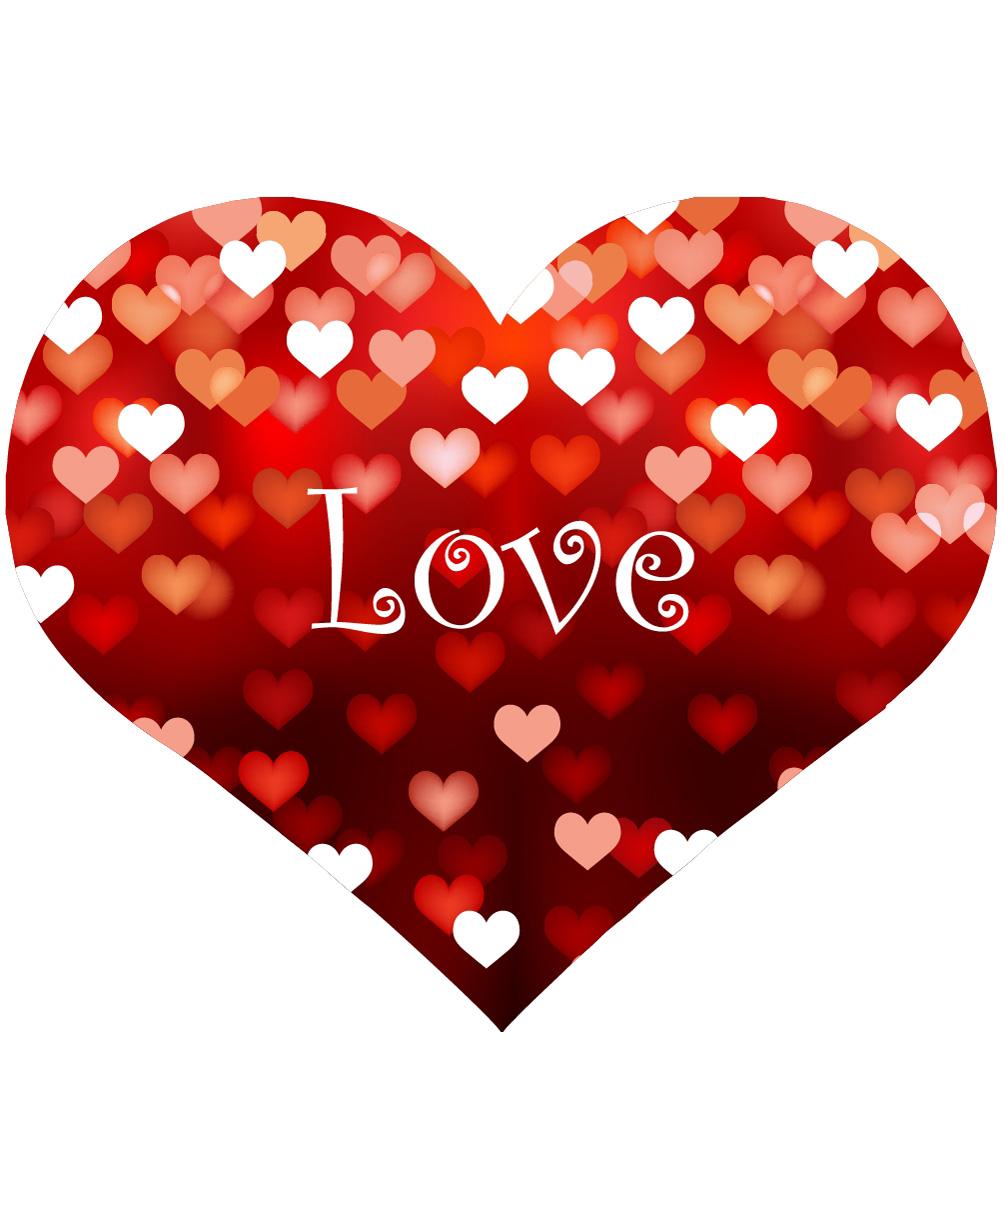 много любви картинки